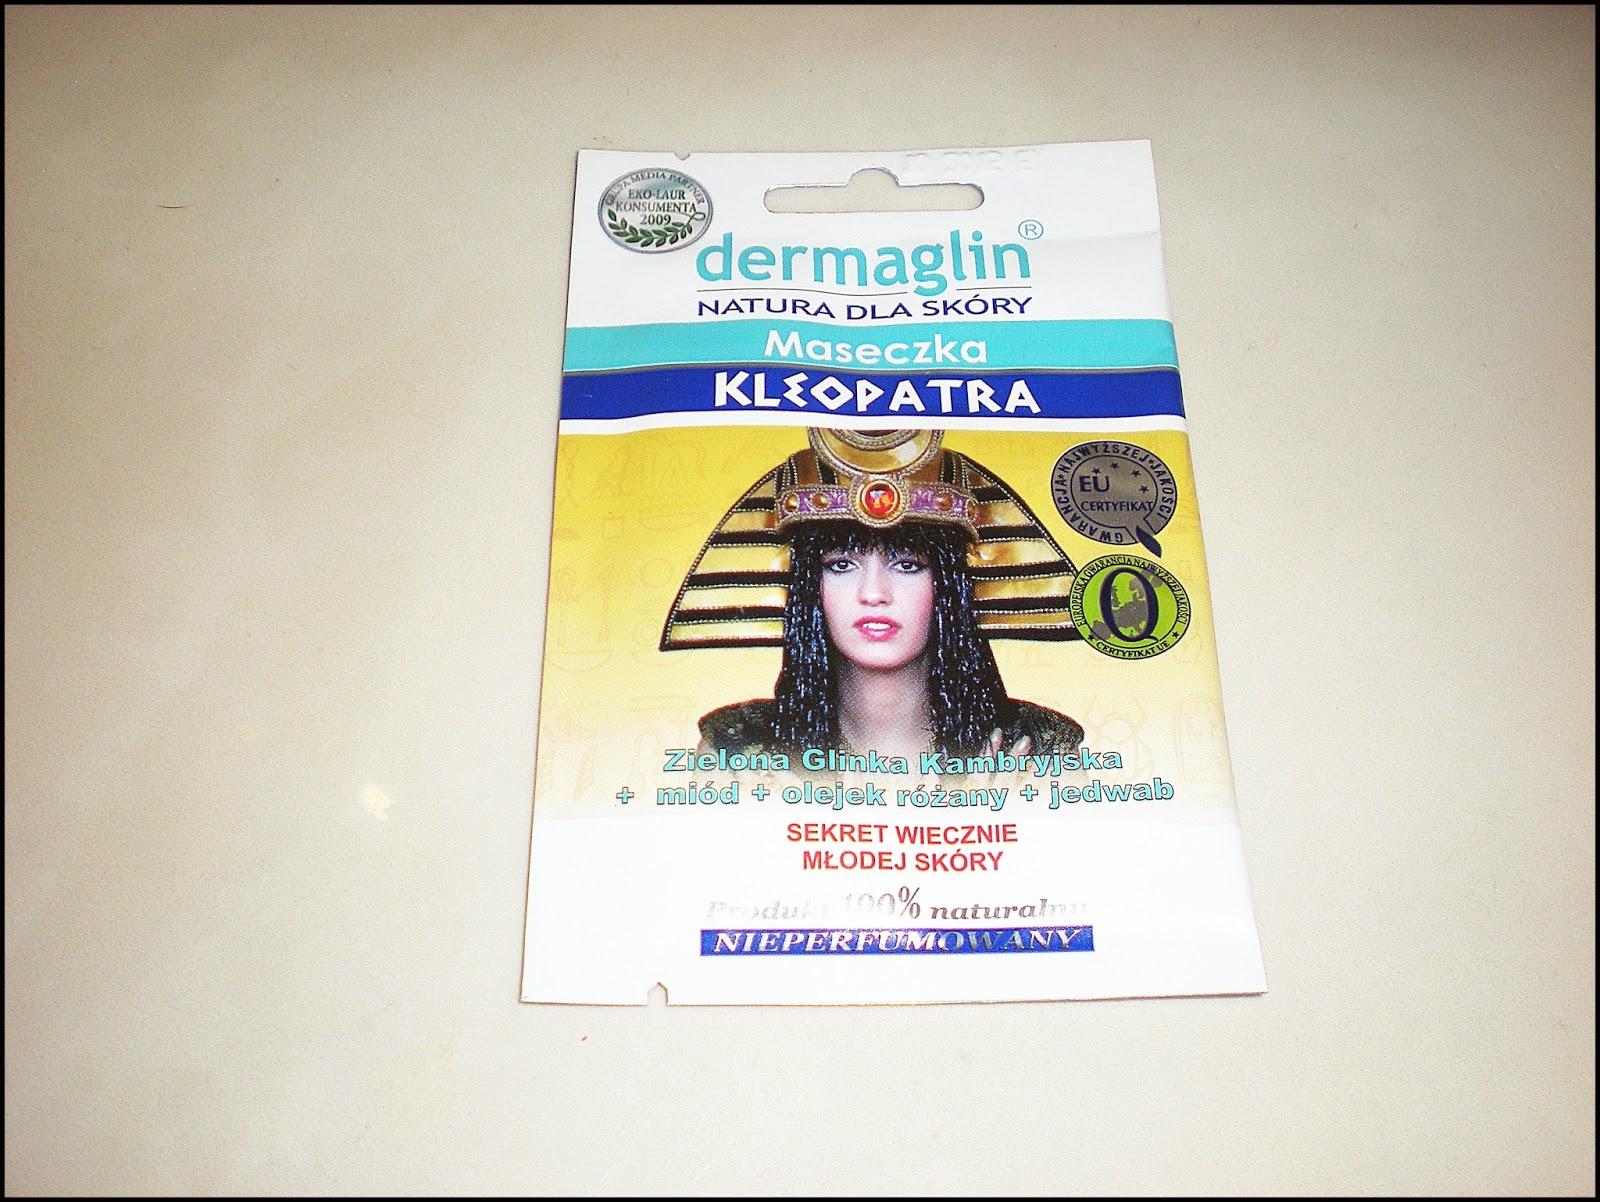 DERMAGLIN: Maseczka Kleopatra